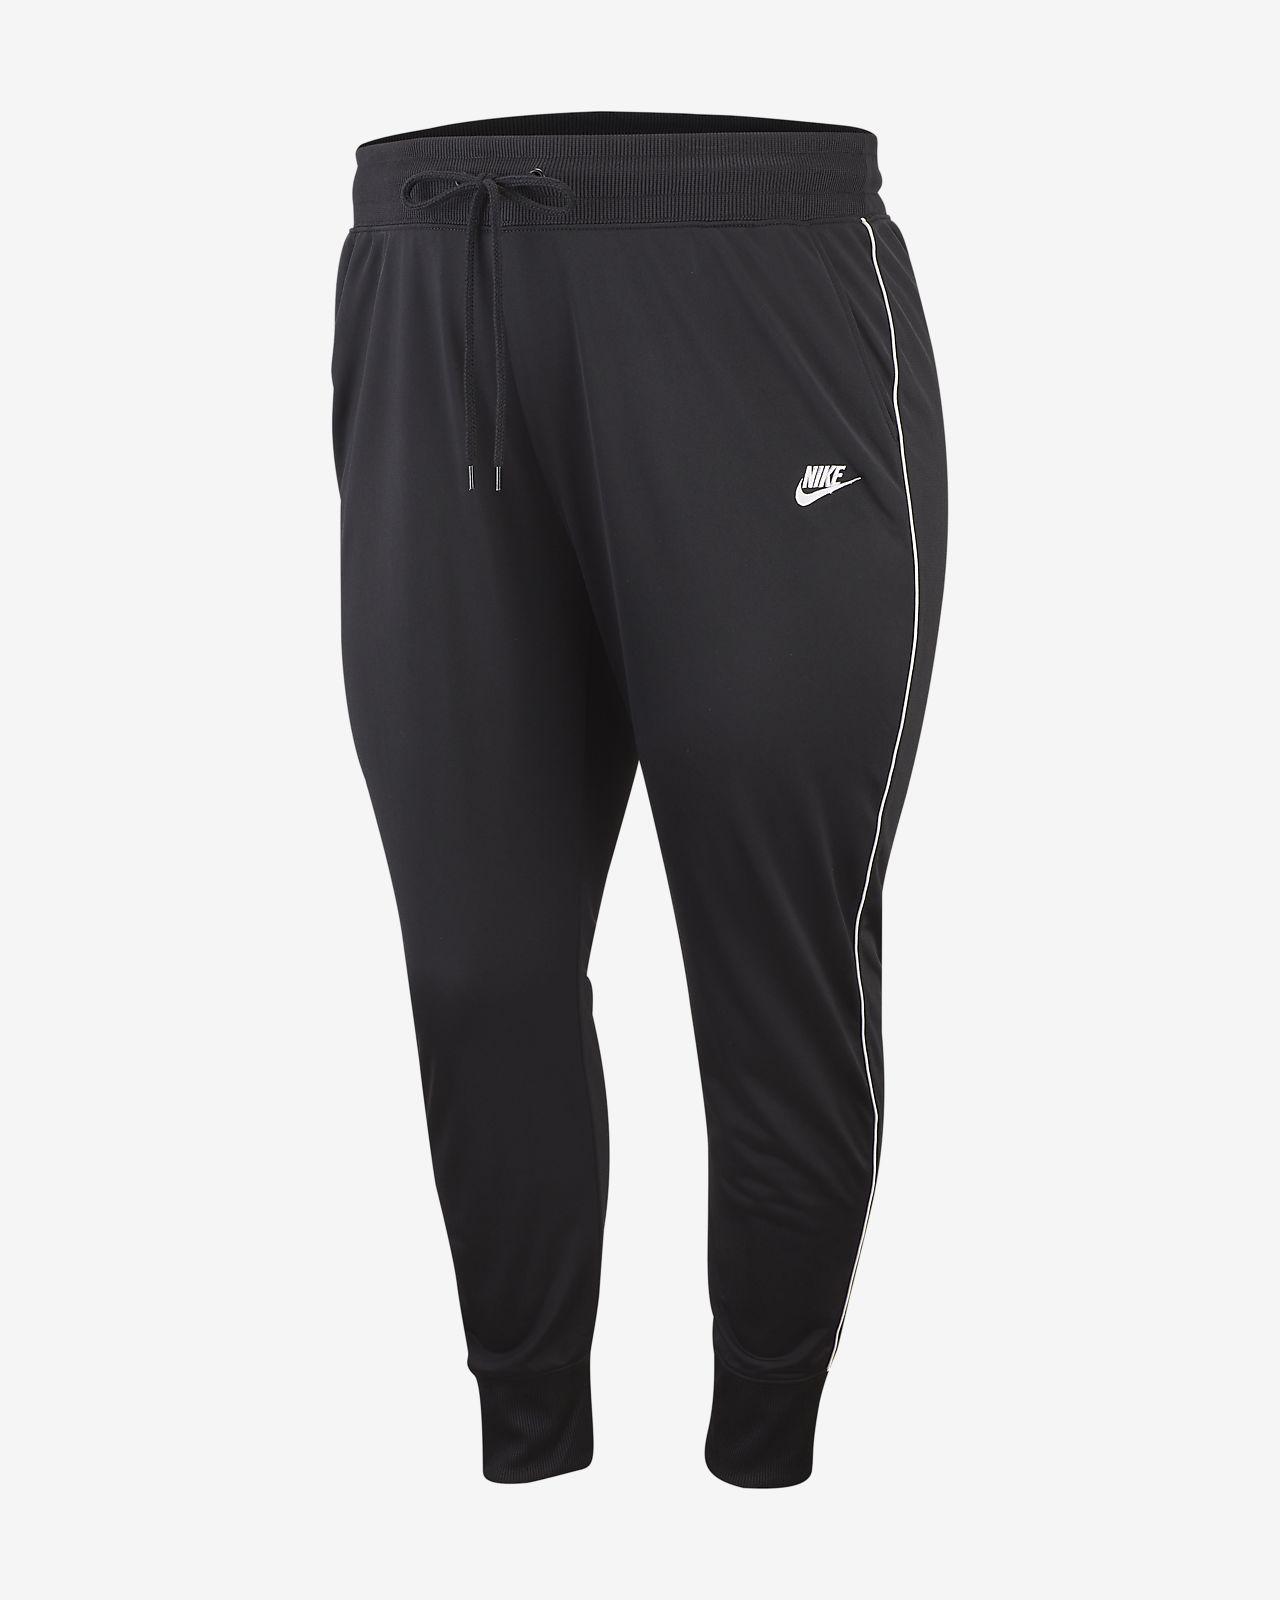 Pantalon de jogging Nike Sportswear Heritage pour Femme (grande taille)